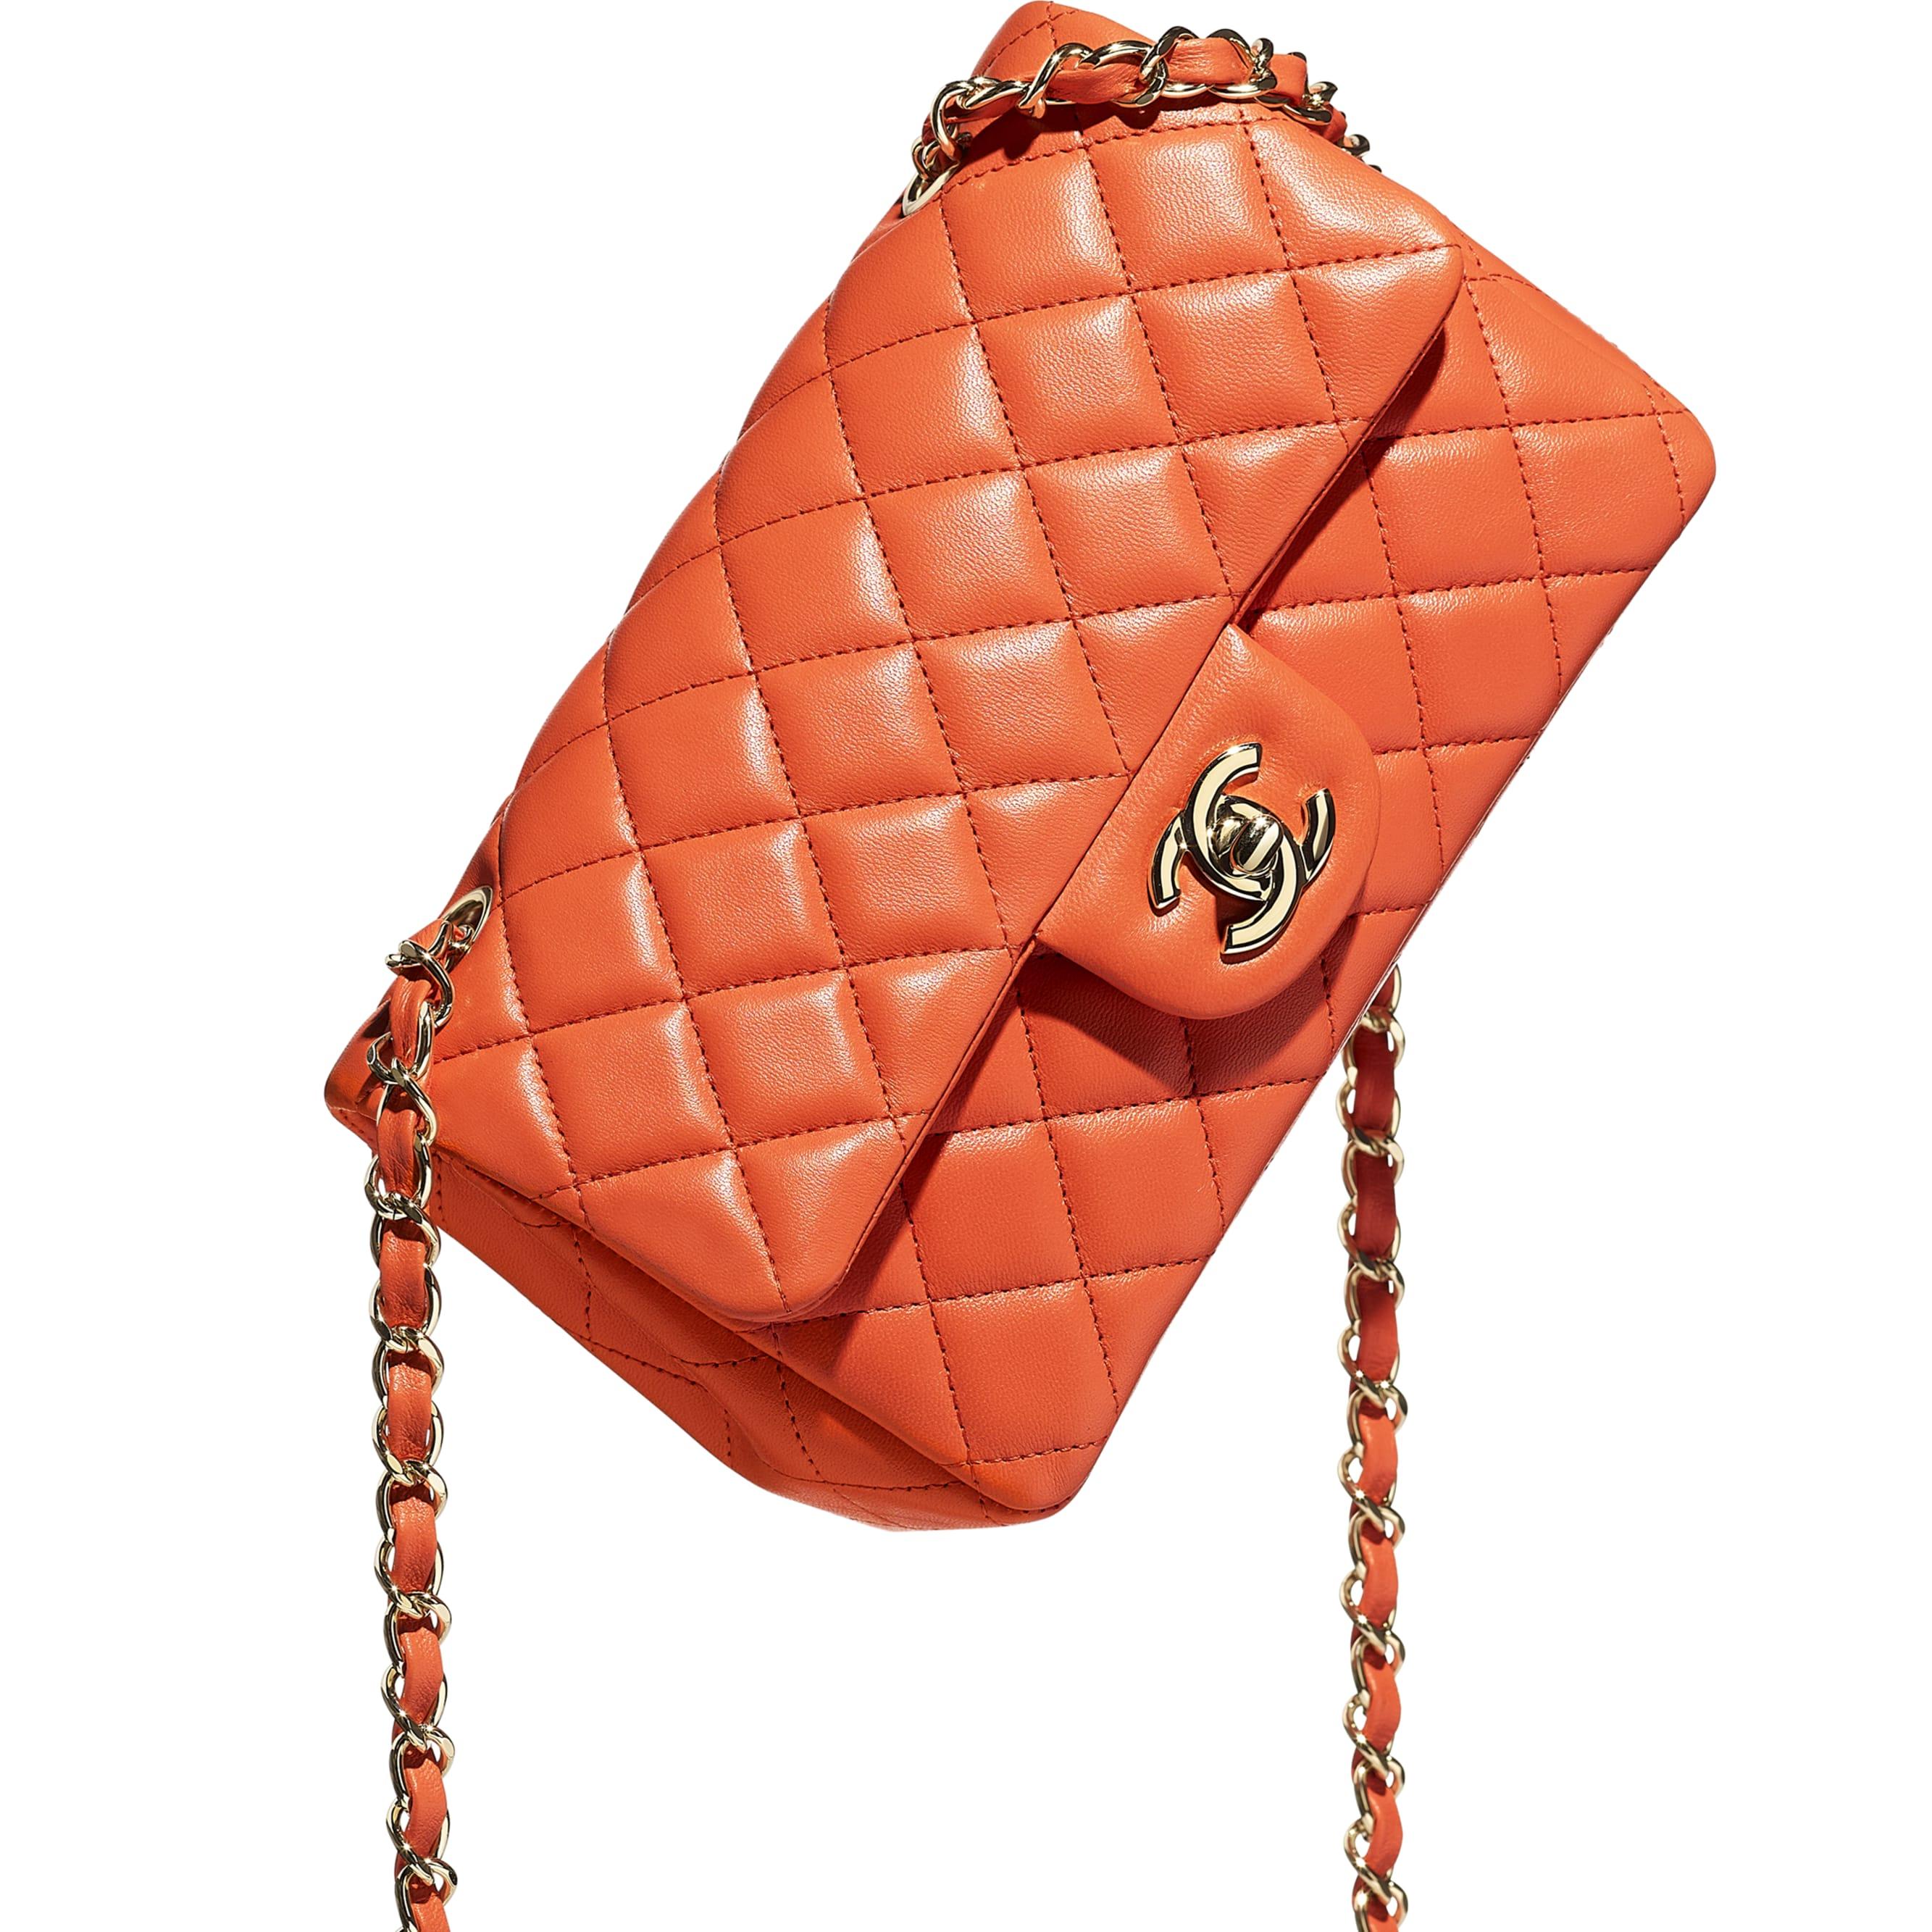 Mini Flap Bag - Orange - Lambskin & Gold-Tone Metal - CHANEL - Extra view - see standard sized version